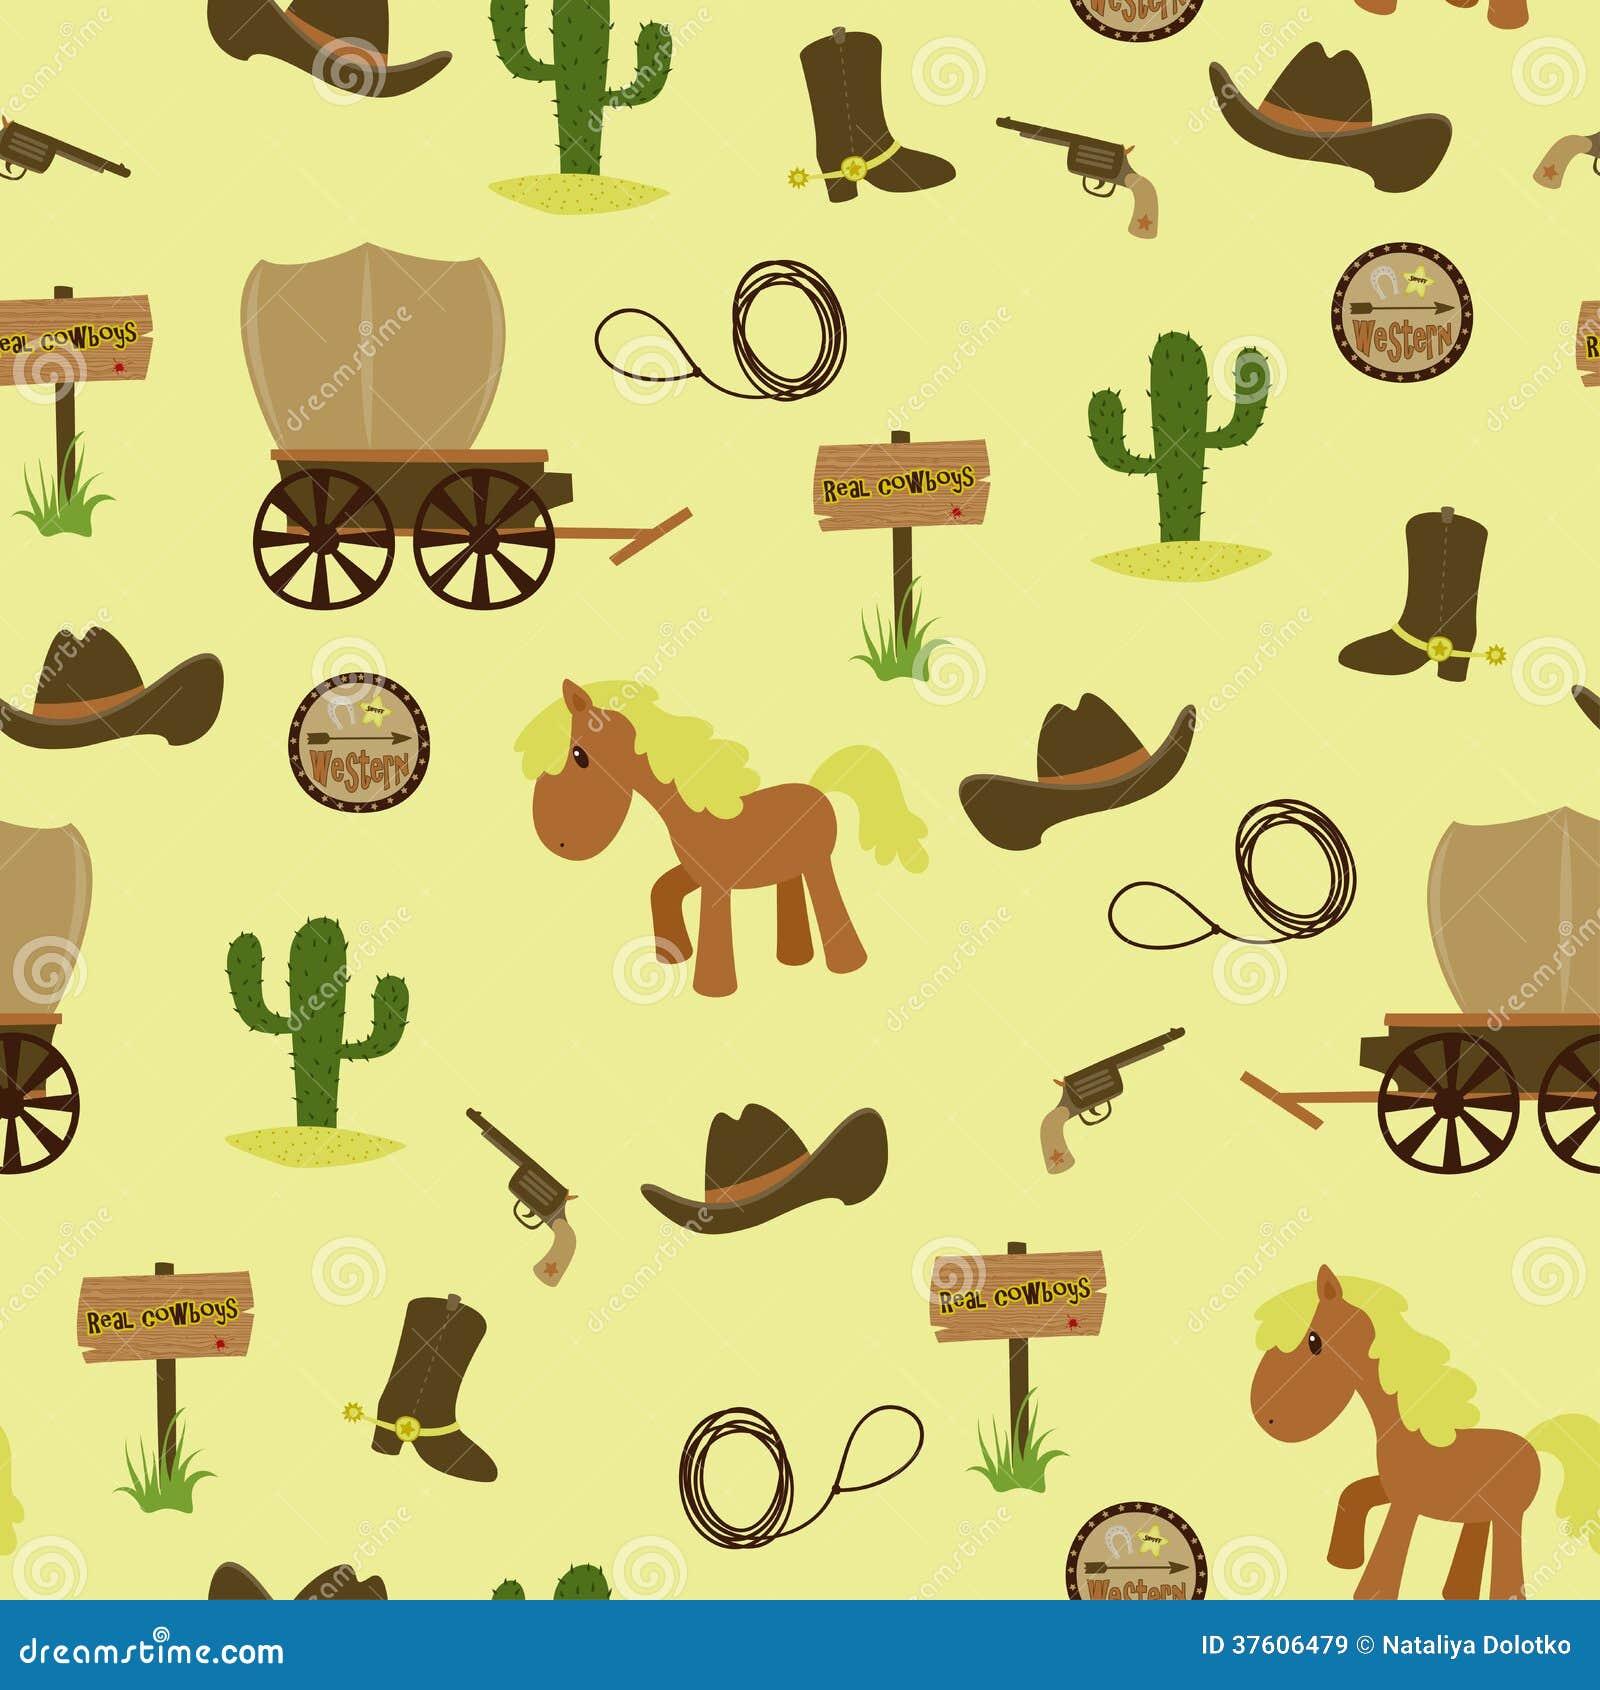 Cowboy Seamless Wallpaper Royalty Free Stock Images ...